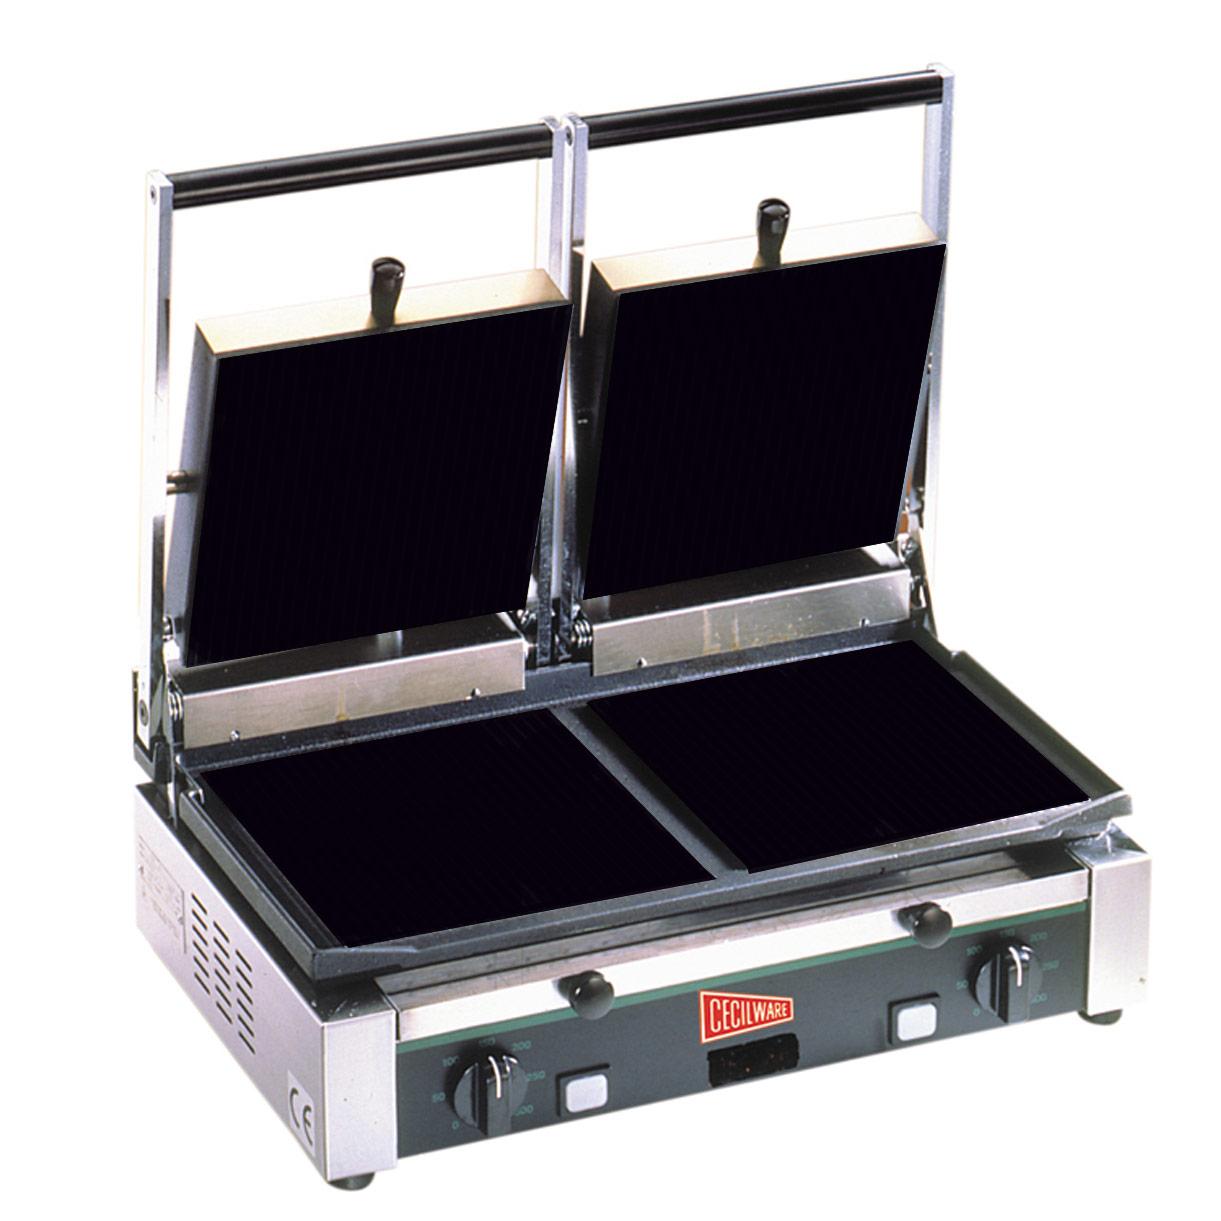 Grindmaster-Cecilware TSG2F sandwich / panini grill